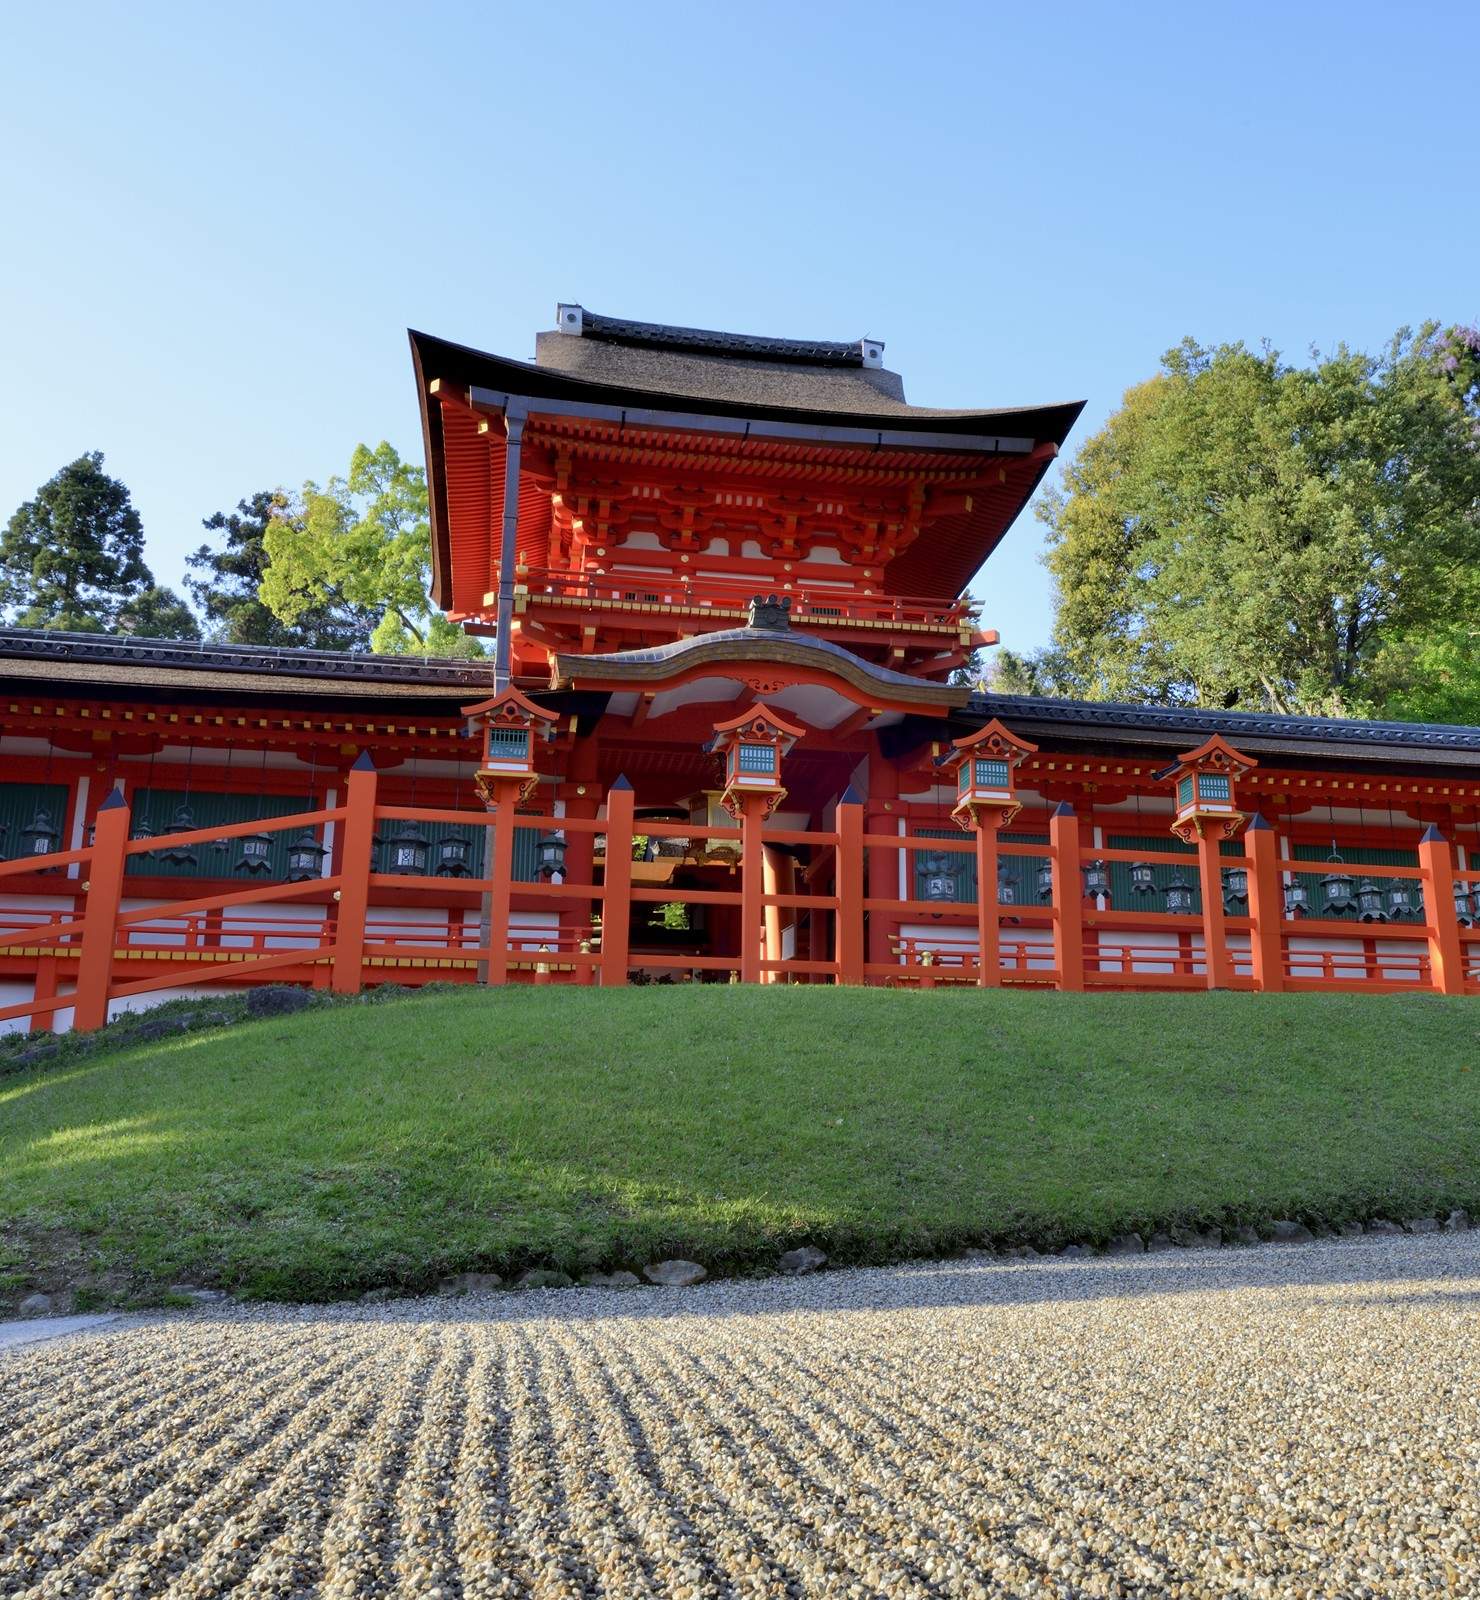 HONO SCREENING AT KASUGA GRAND SHRINE